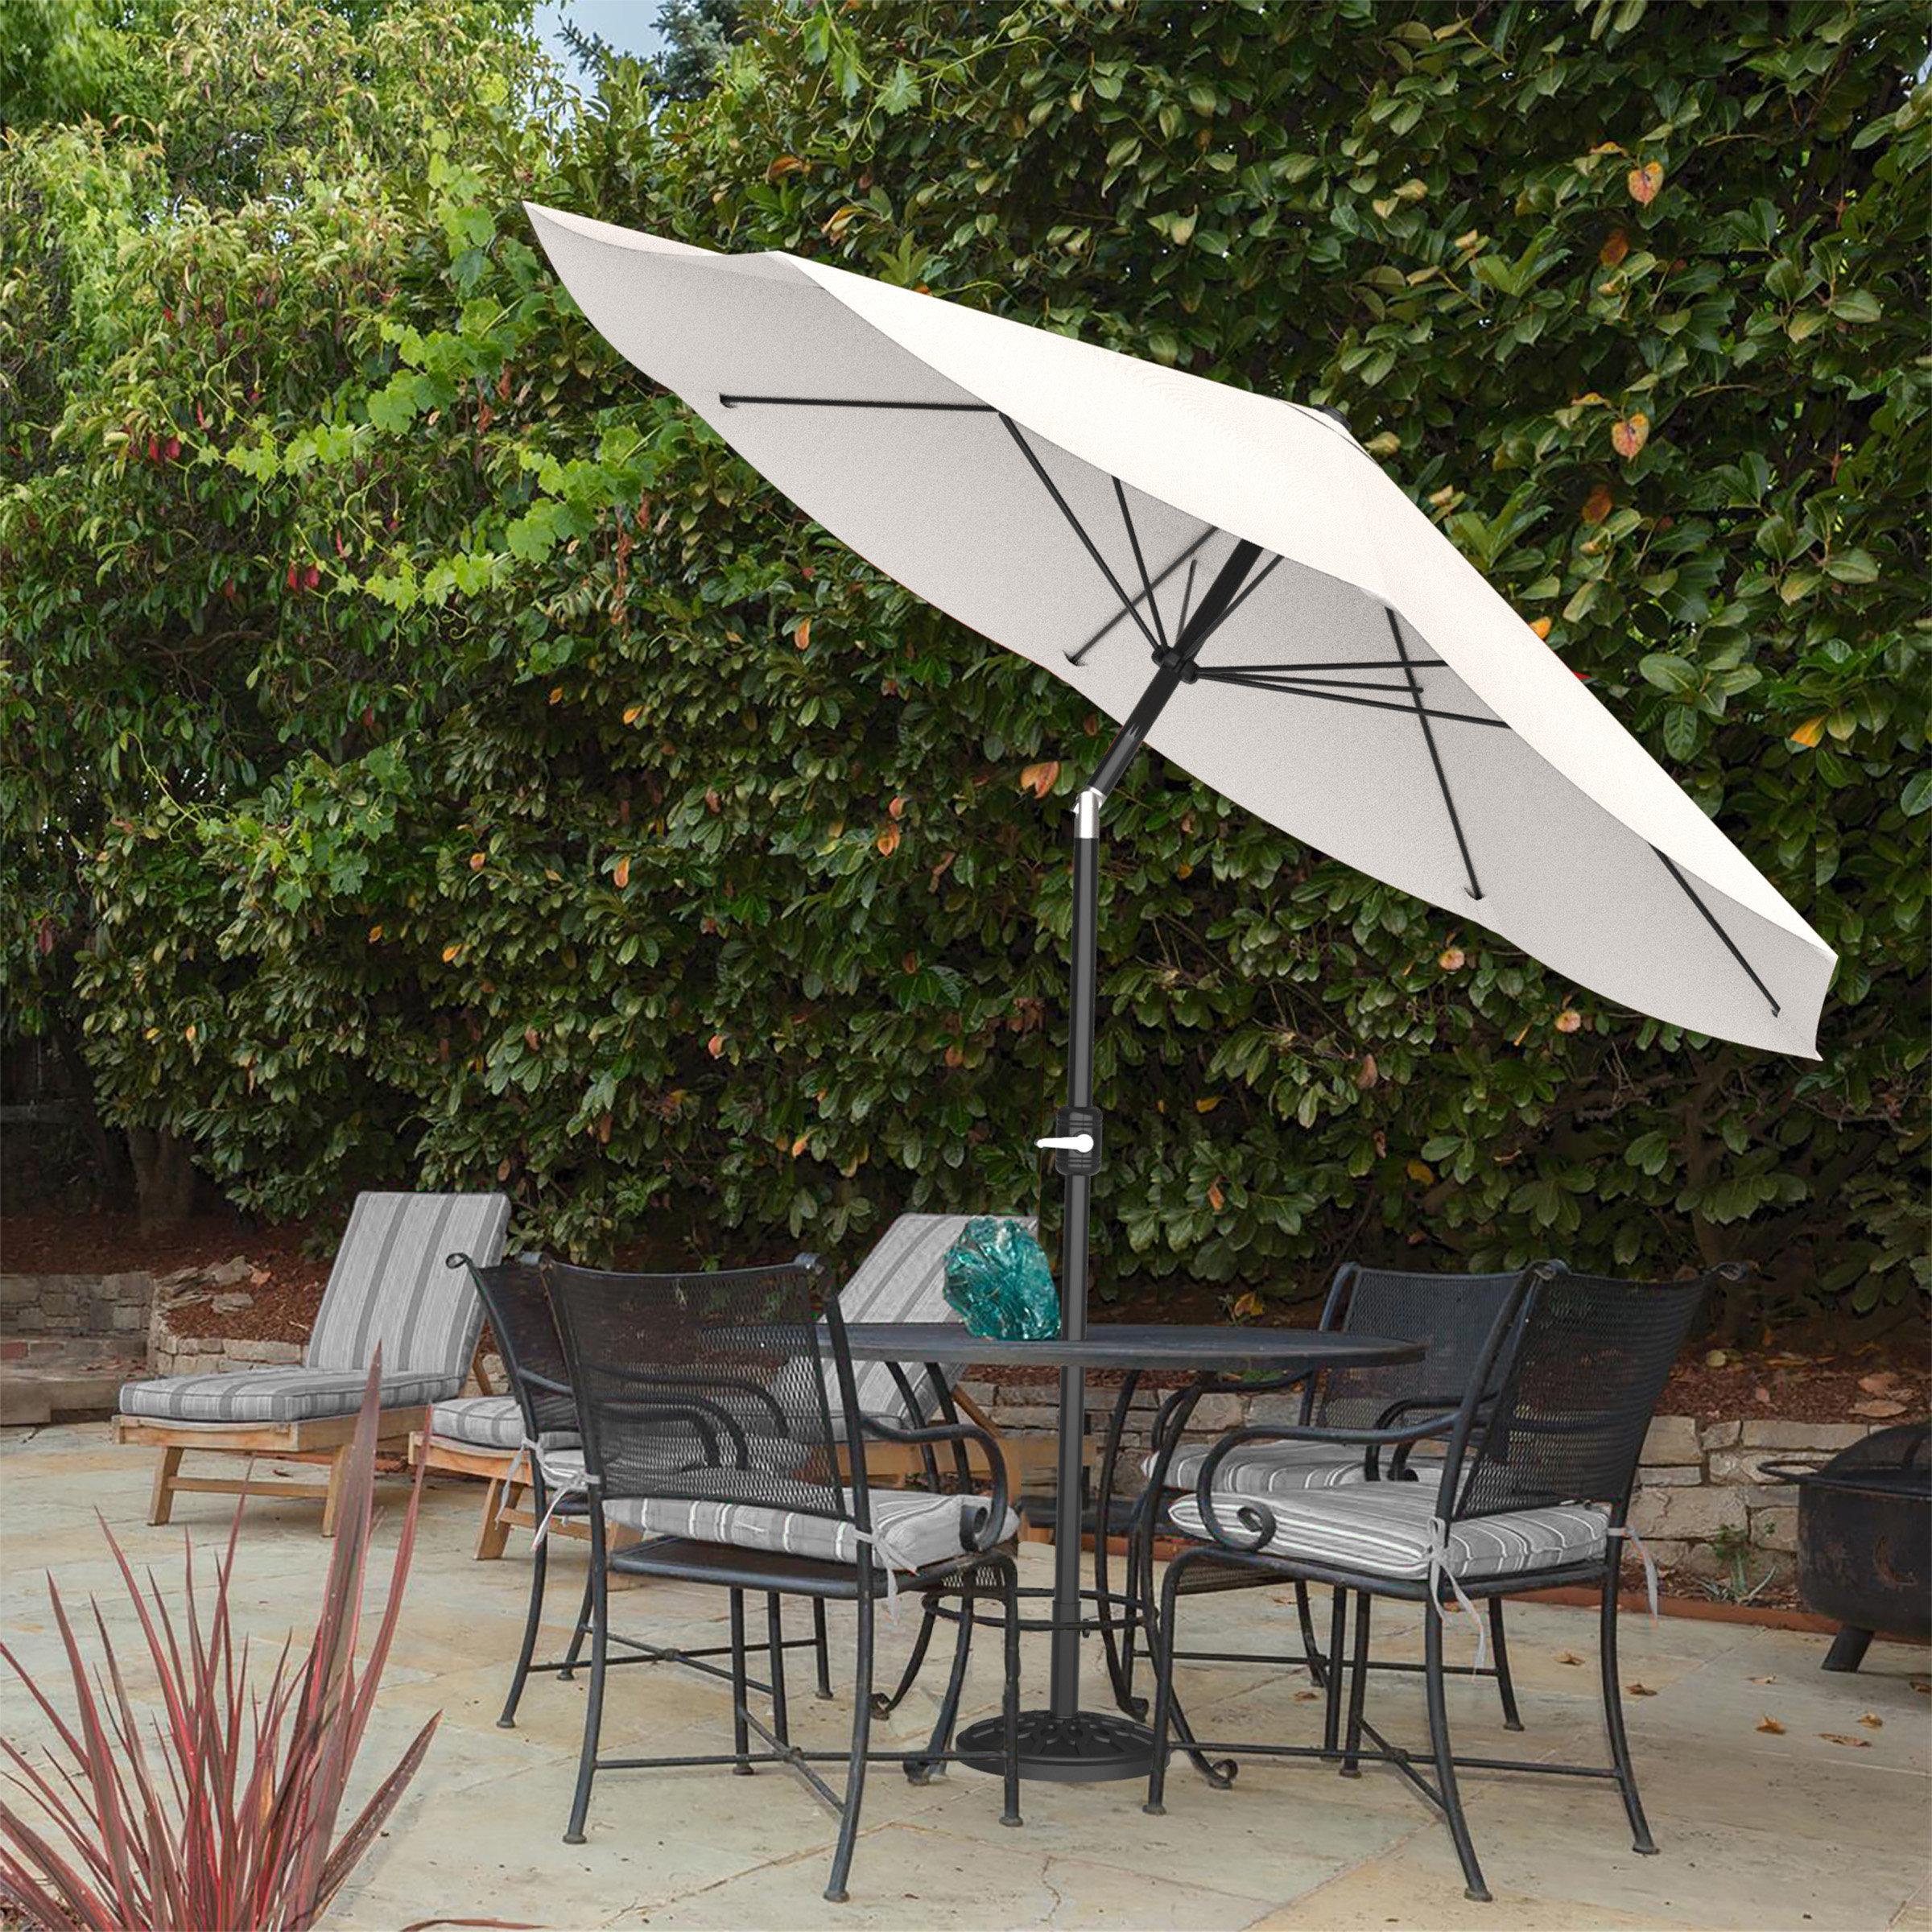 2020 Kelton 10' Market Umbrella Intended For Kelton Market Umbrellas (View 1 of 20)